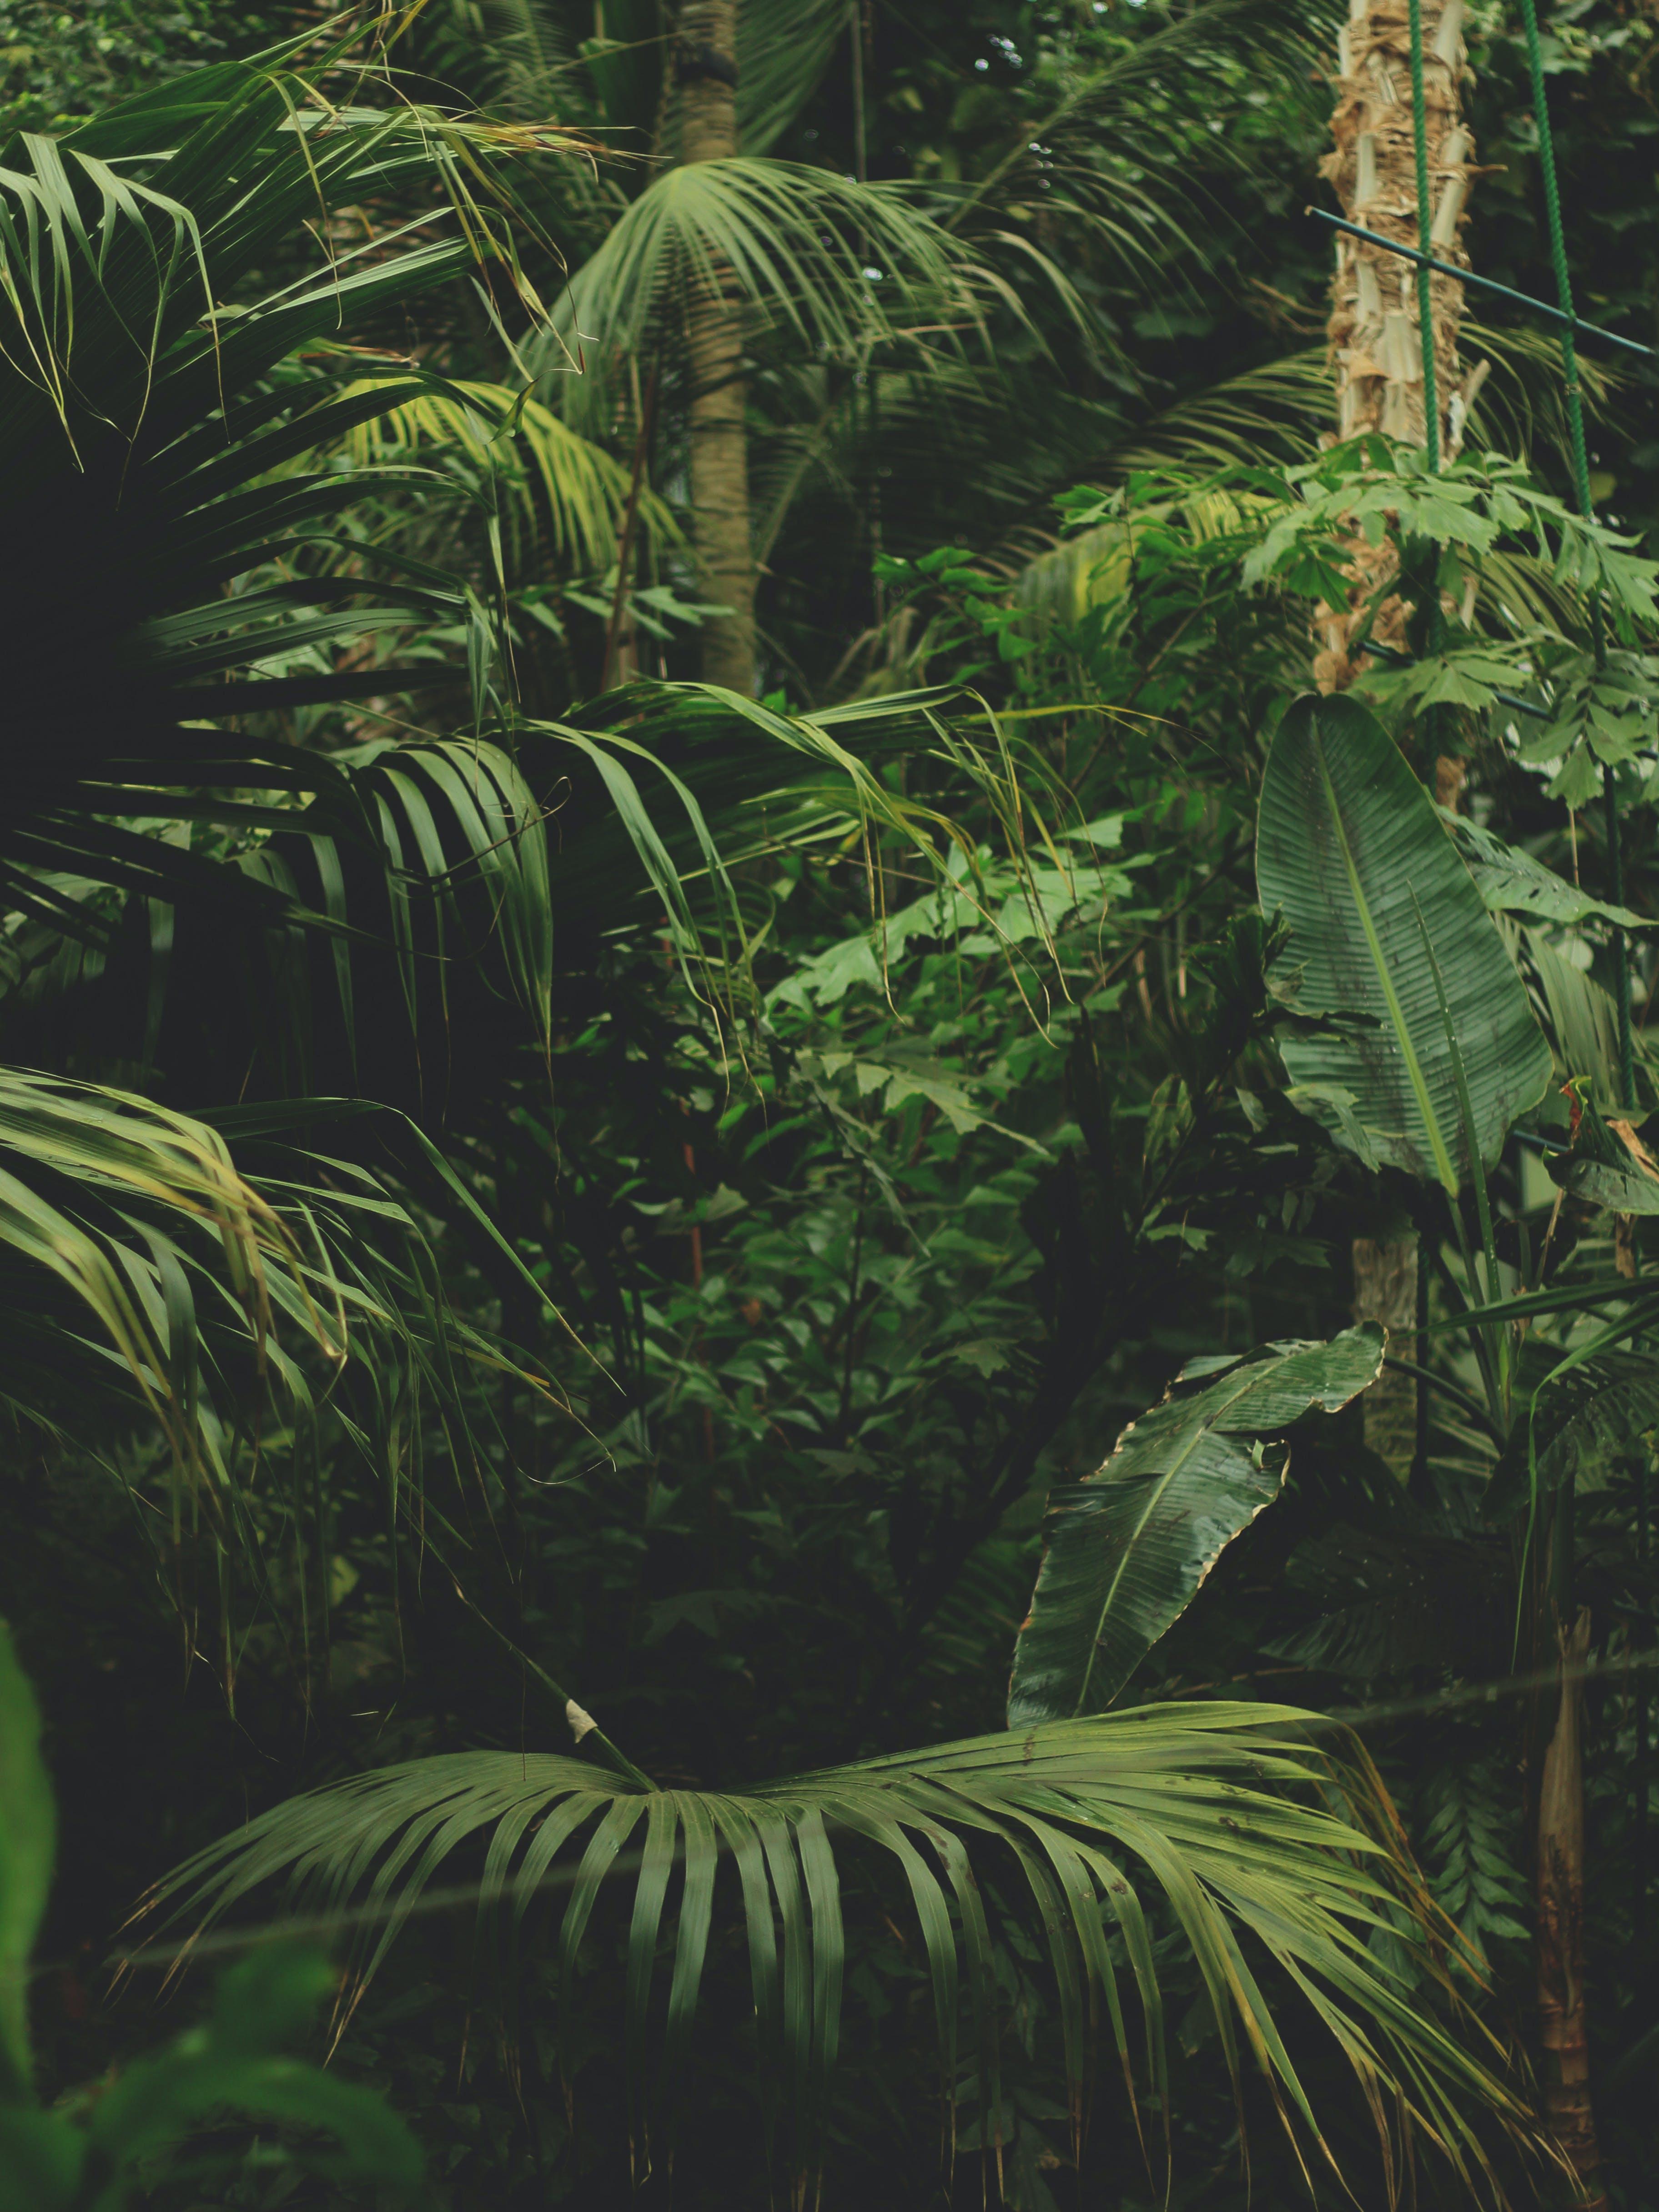 Free stock photo of botanical, botanical garden, botanics, dark green